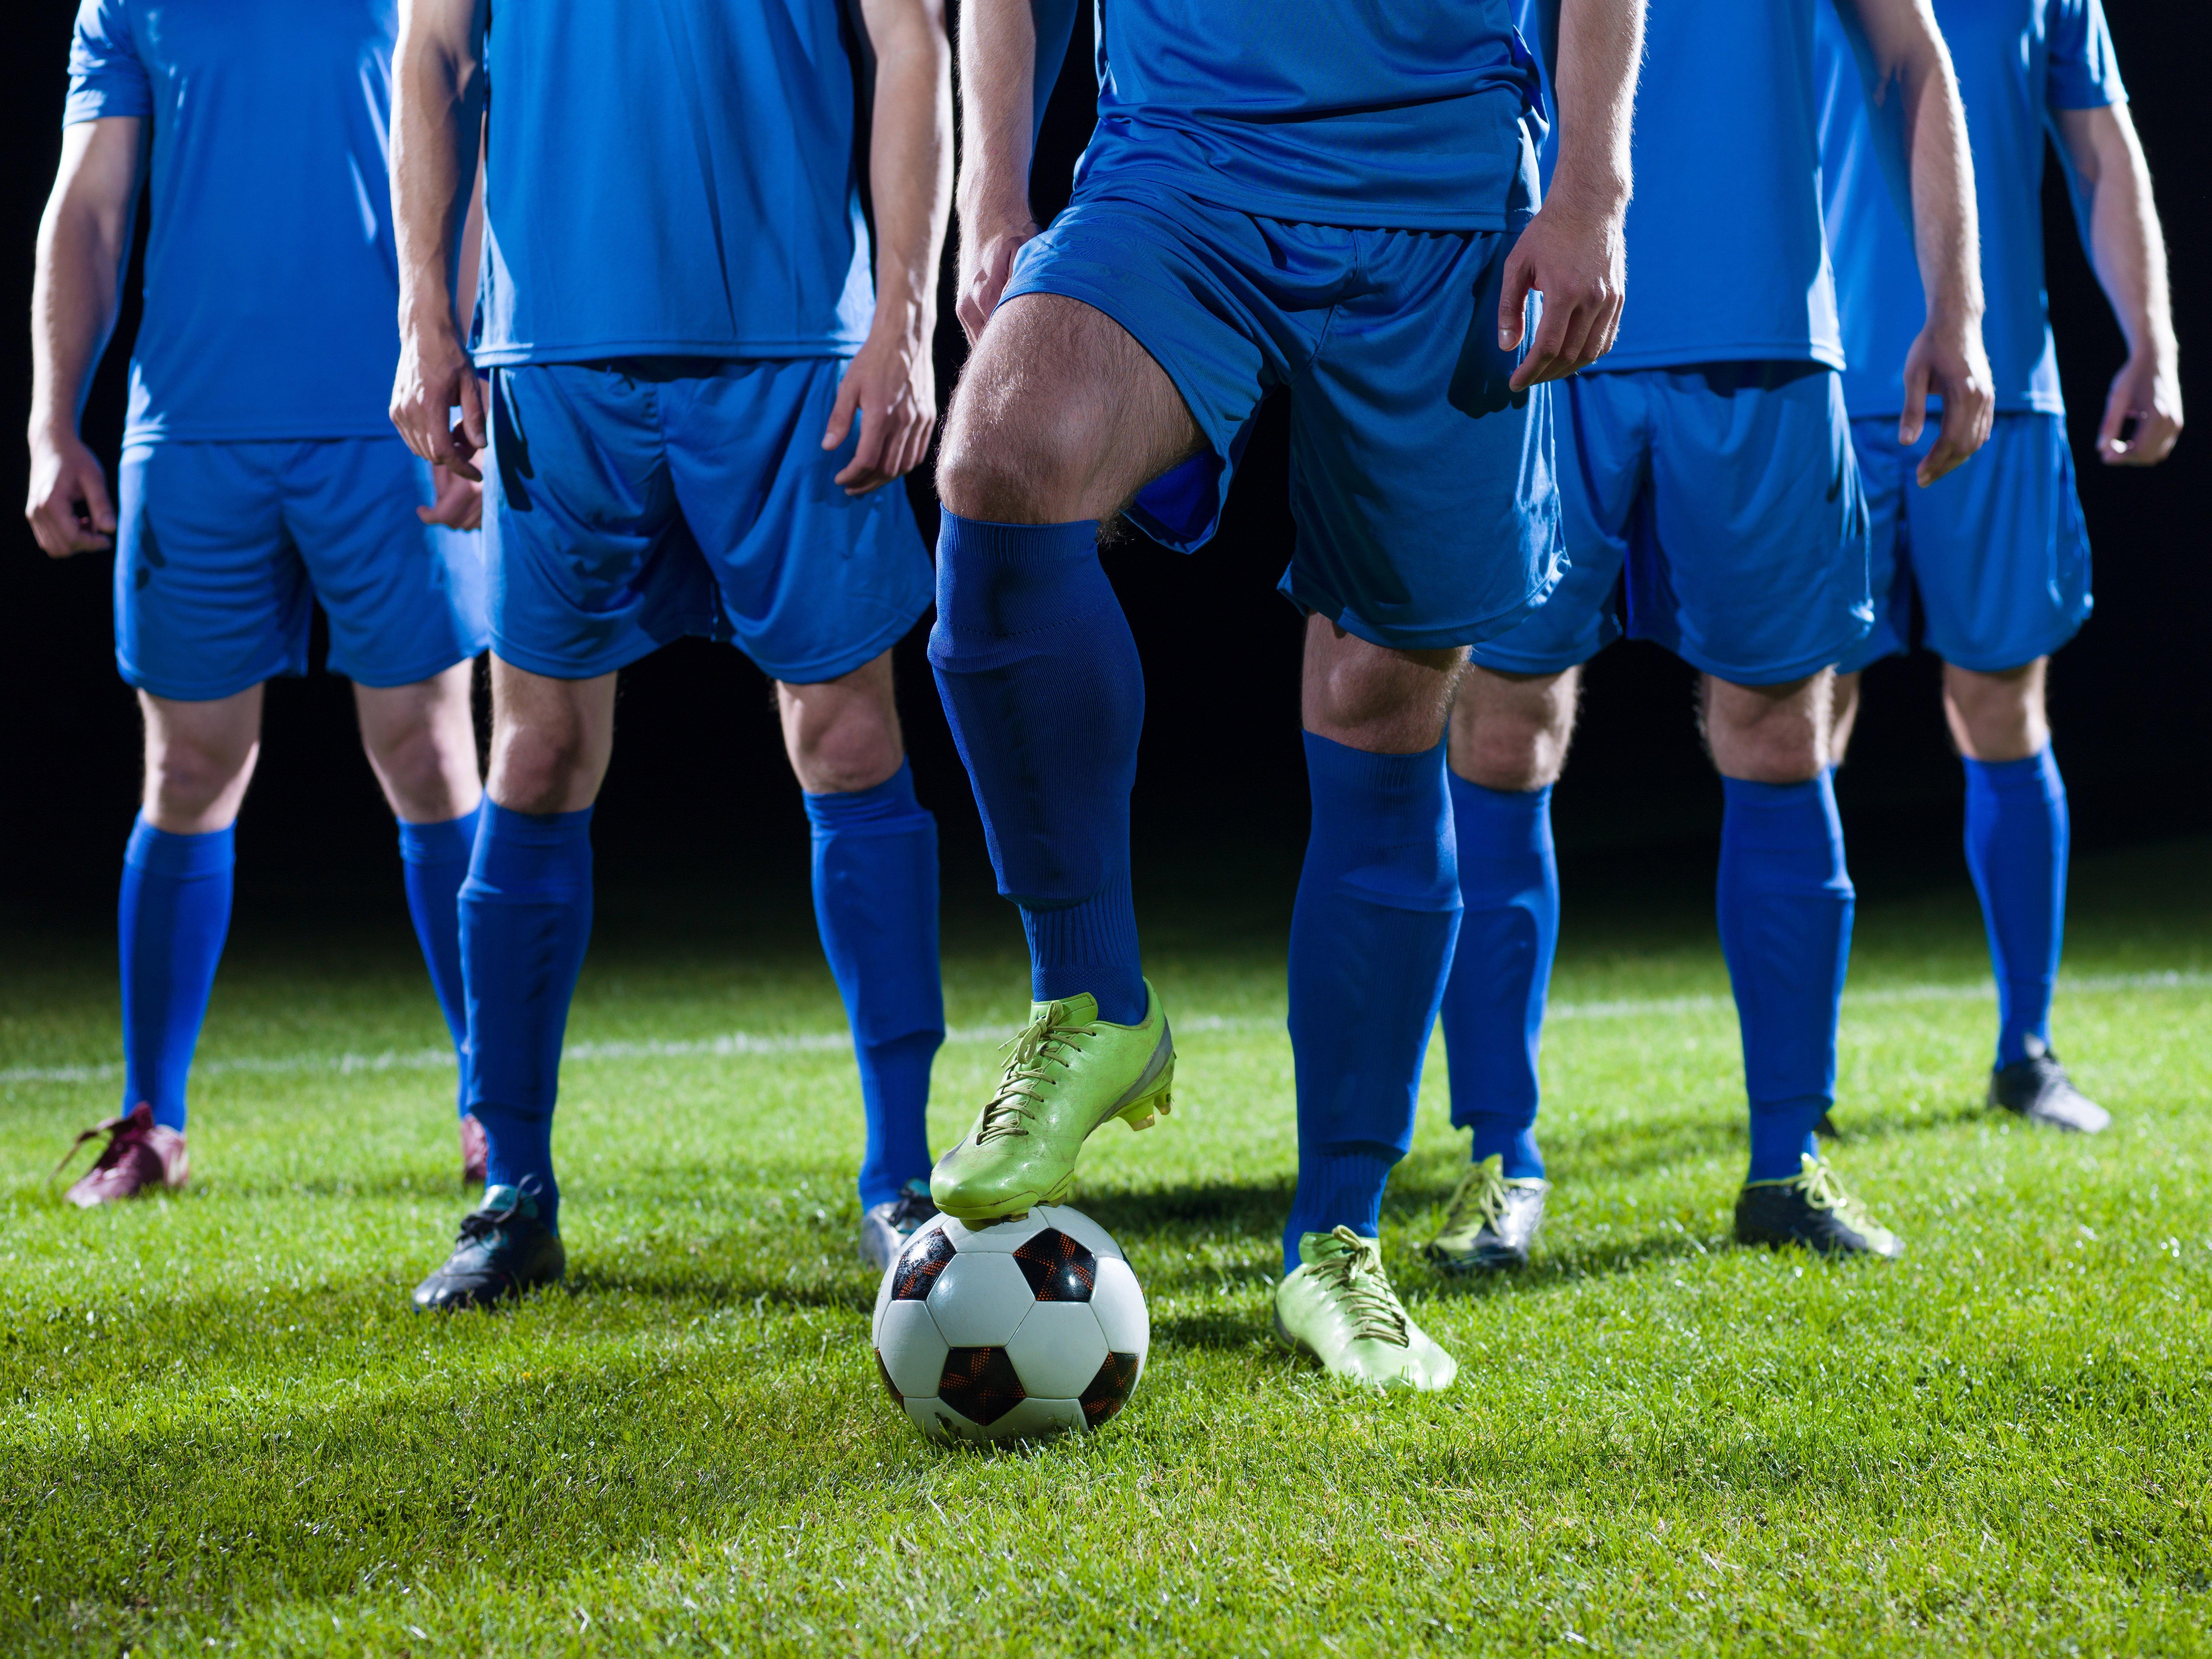 Soccer team.jpeg